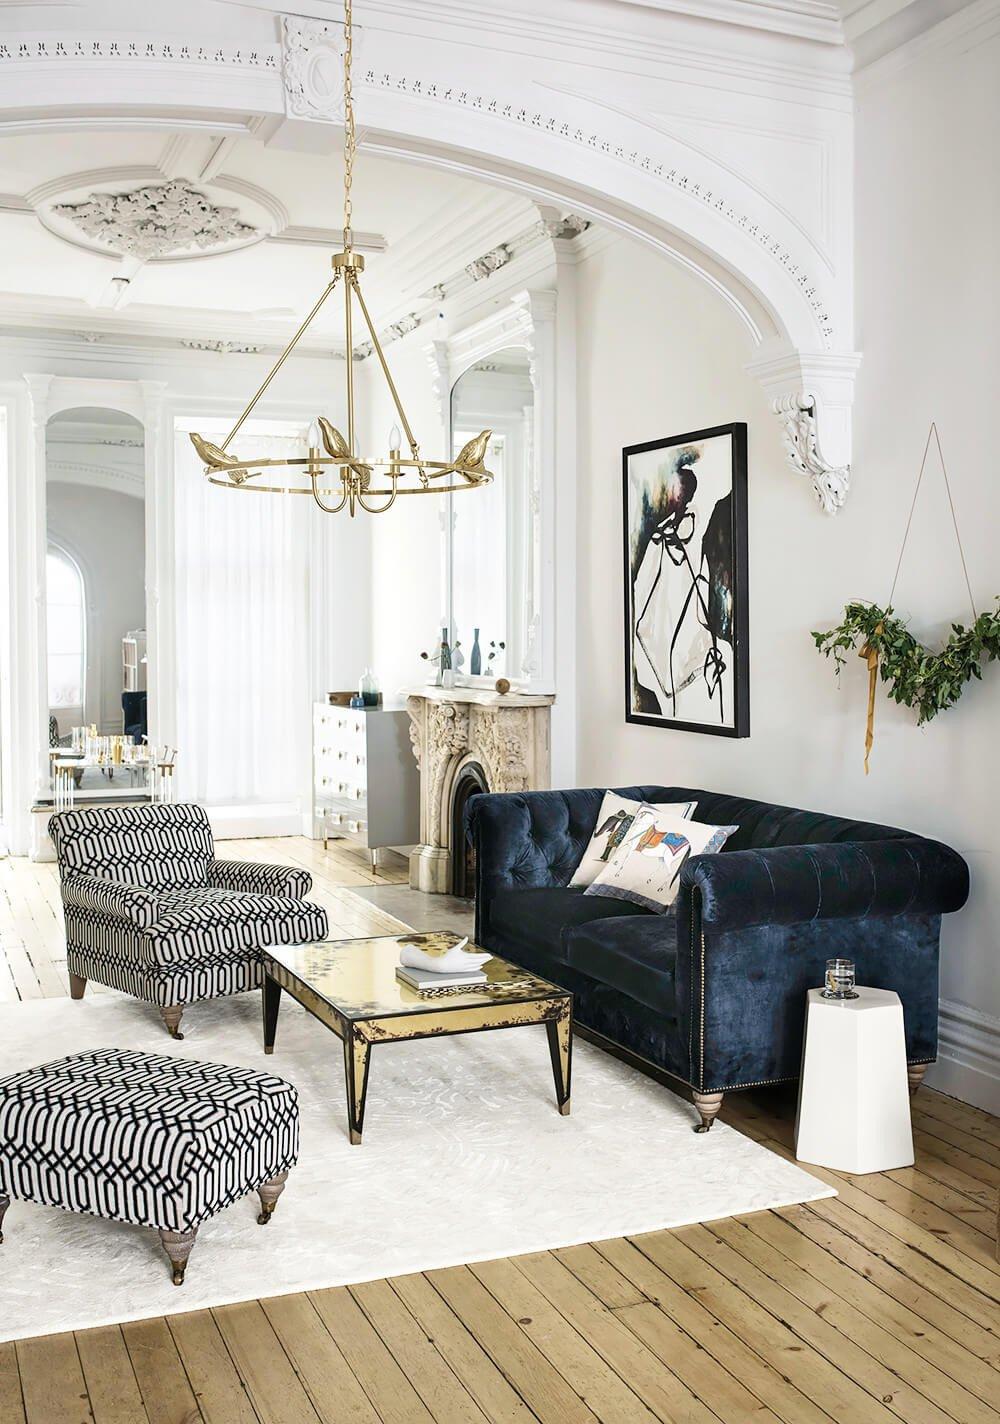 Modern Blue Living Room Decorating Ideas Elegant 26 Best Modern Living Room Decorating Ideas and Designs for 2019